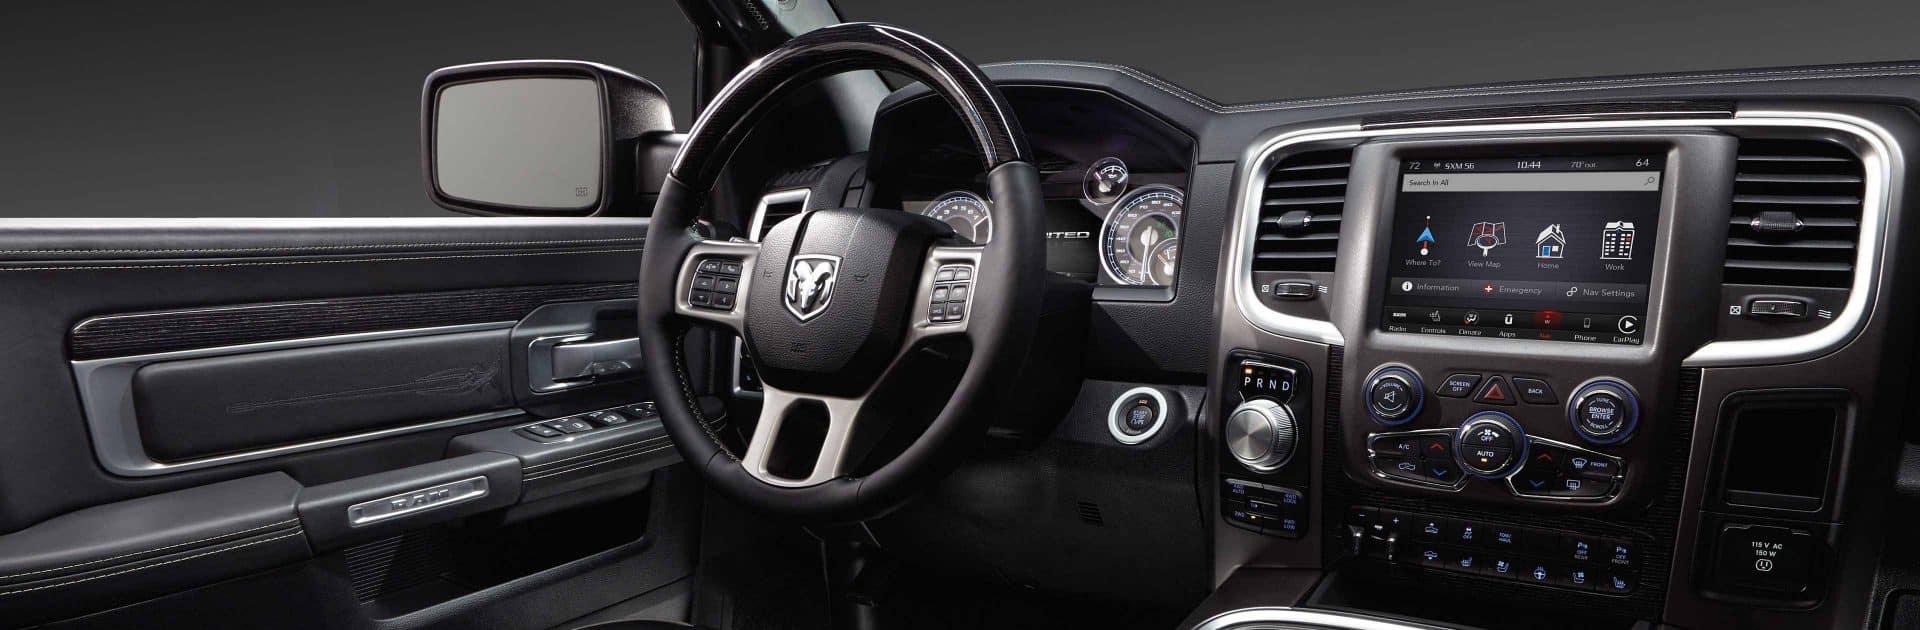 WardsAuto Includes 2018 Ram 1500 on Best Interiors List